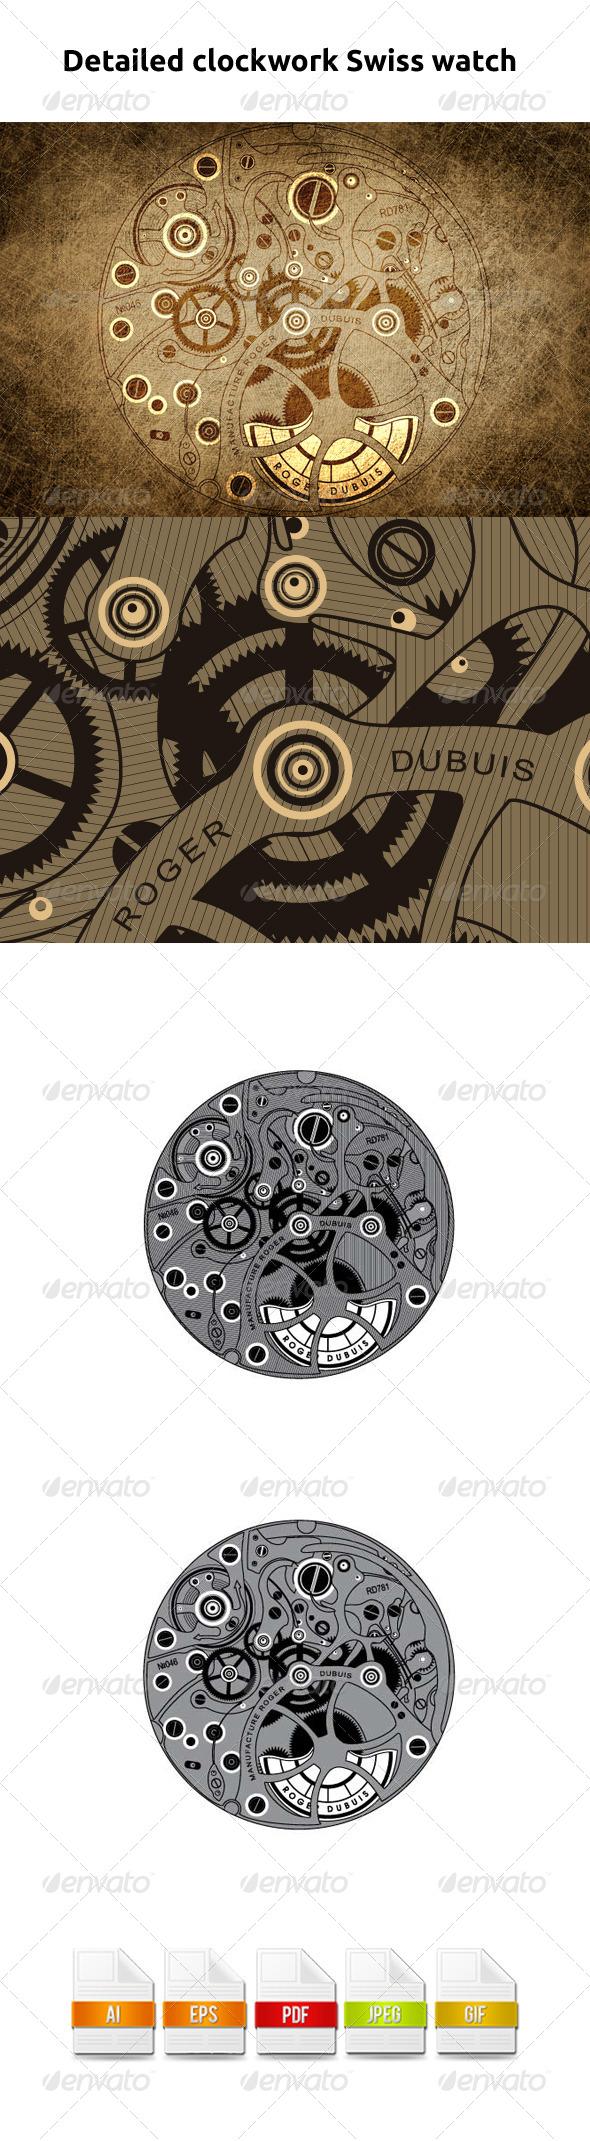 GraphicRiver Detailed clockwork Swiss watch 5440911